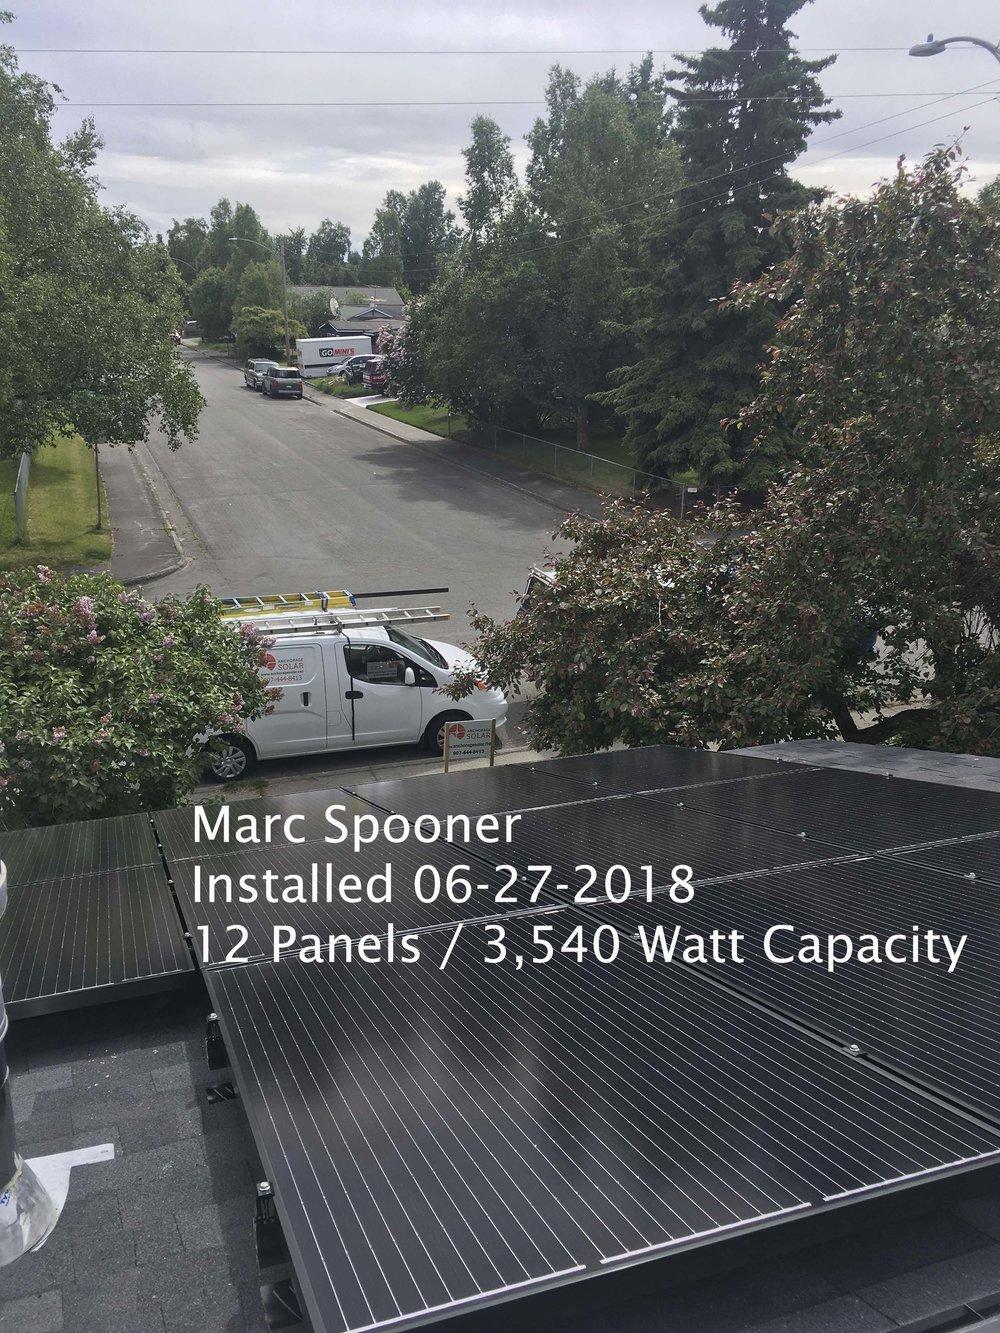 Spooner_3079.jpg